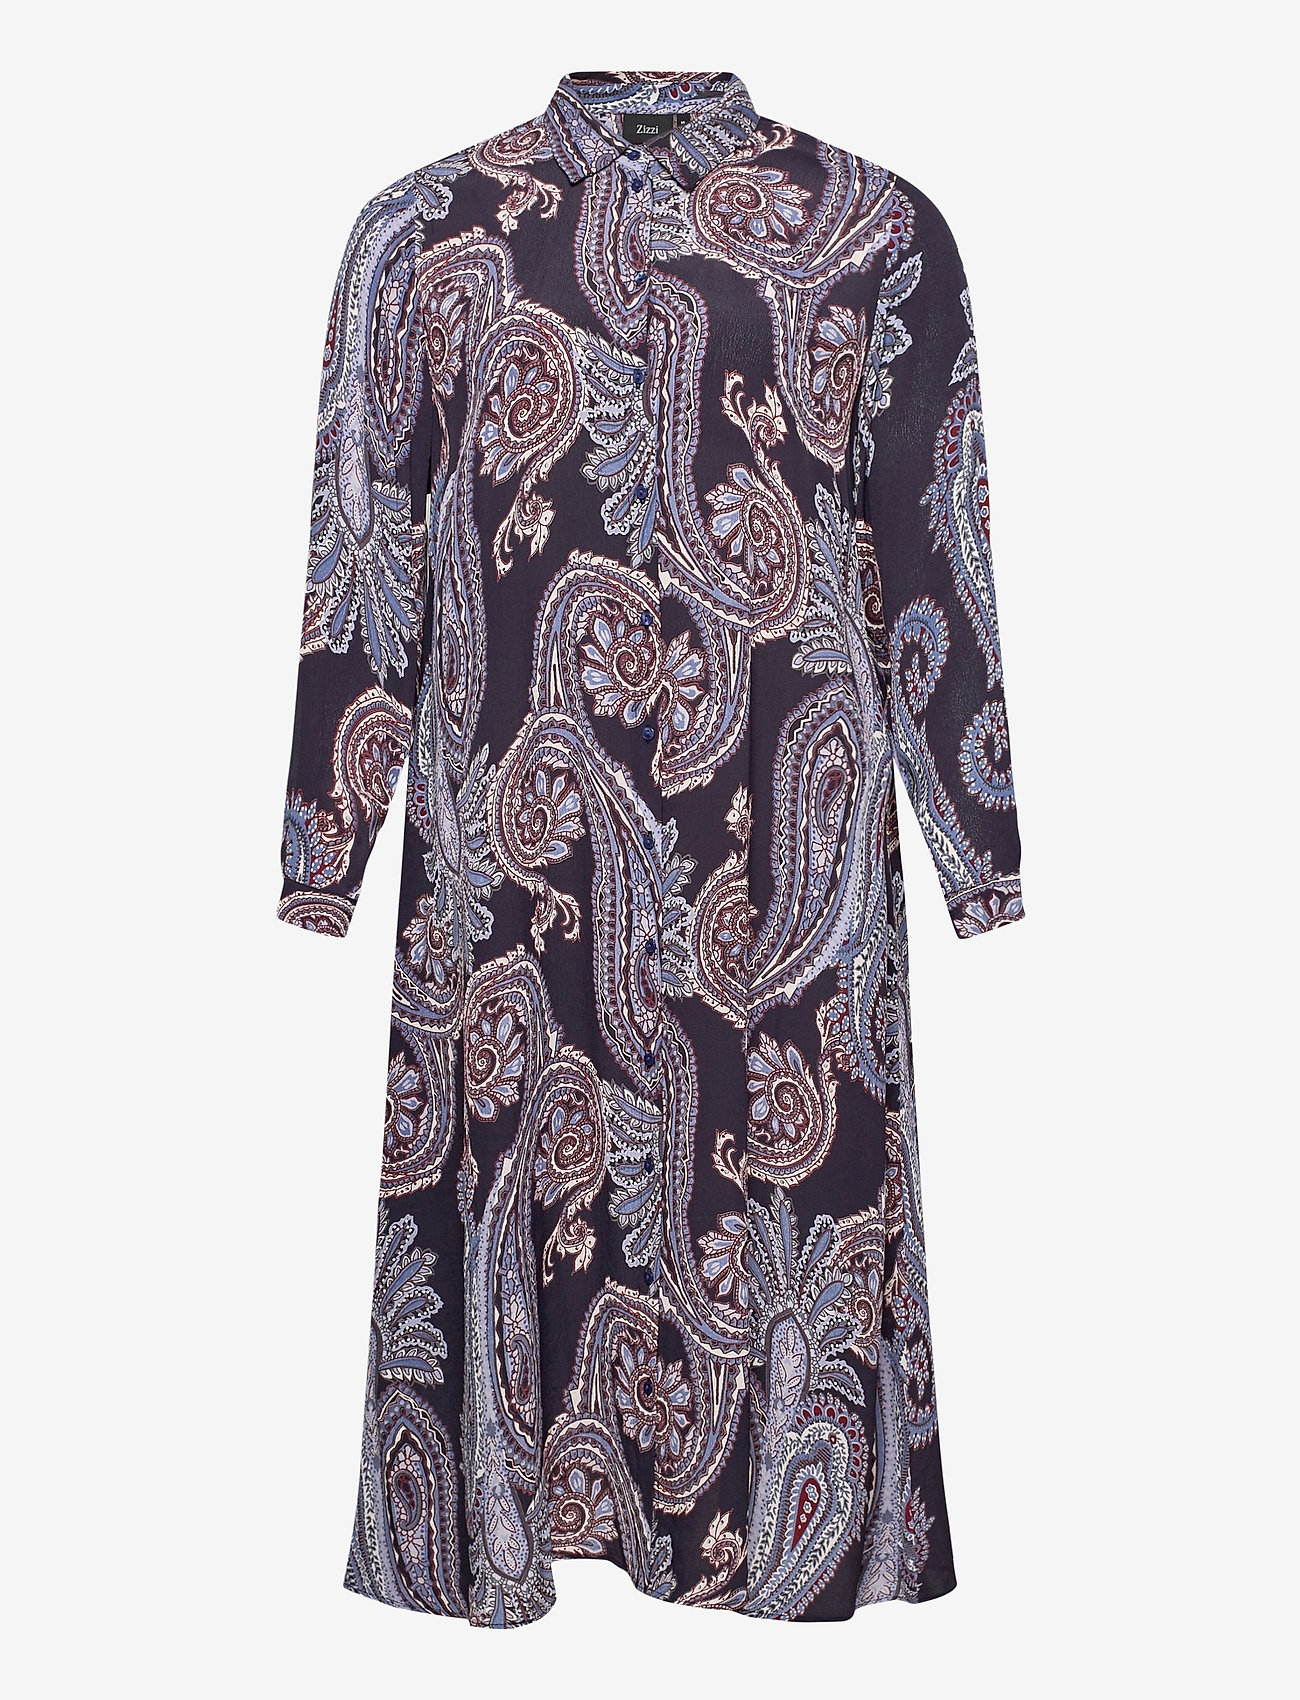 Zizzi - Dress Print Plus Size Long Sleeves Collar - alledaagse jurken - dark blue - 0